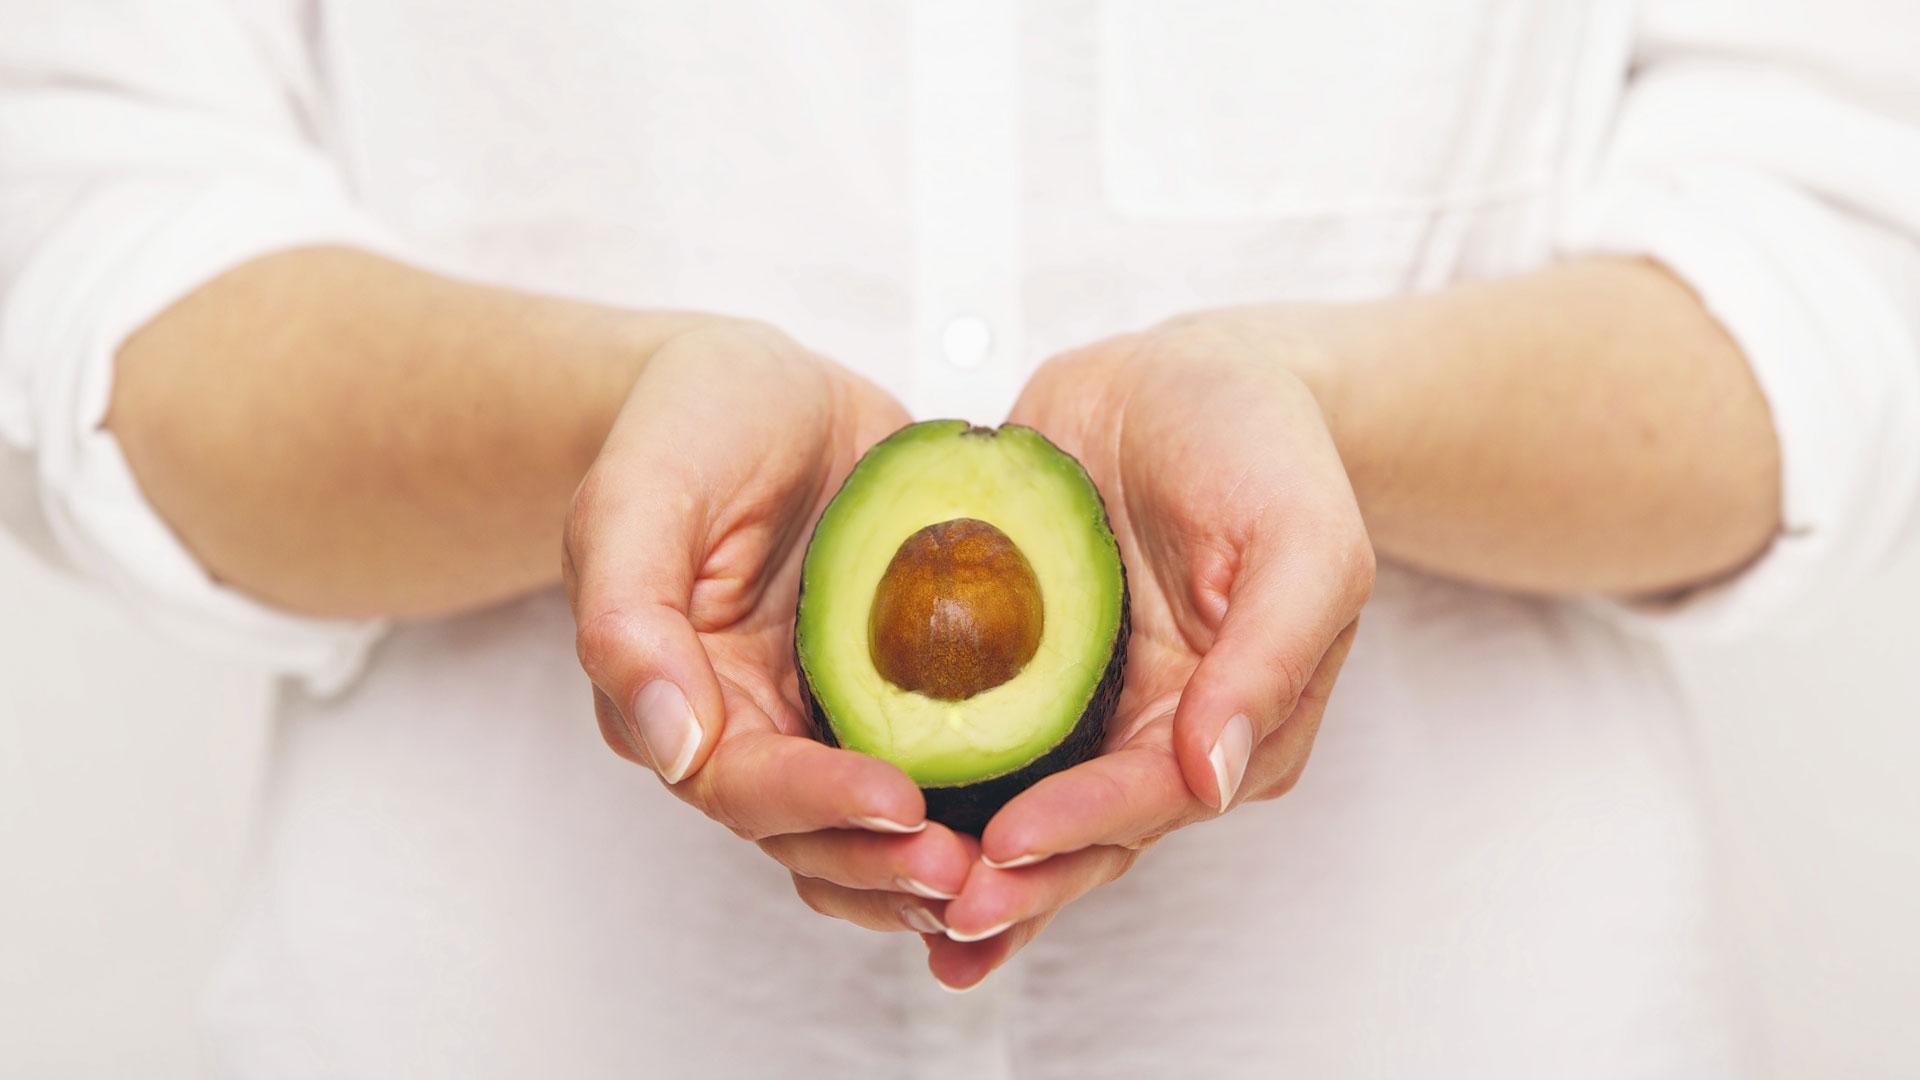 Woman holding a sliced avacado